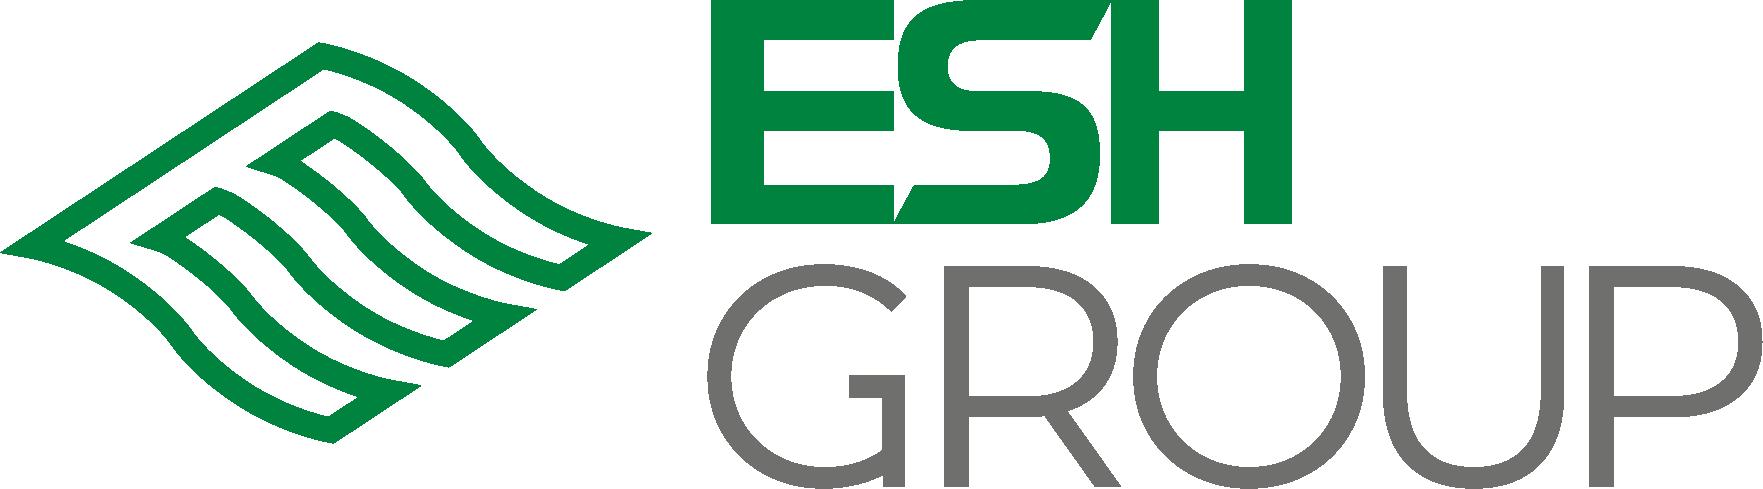 Esh Group Logo